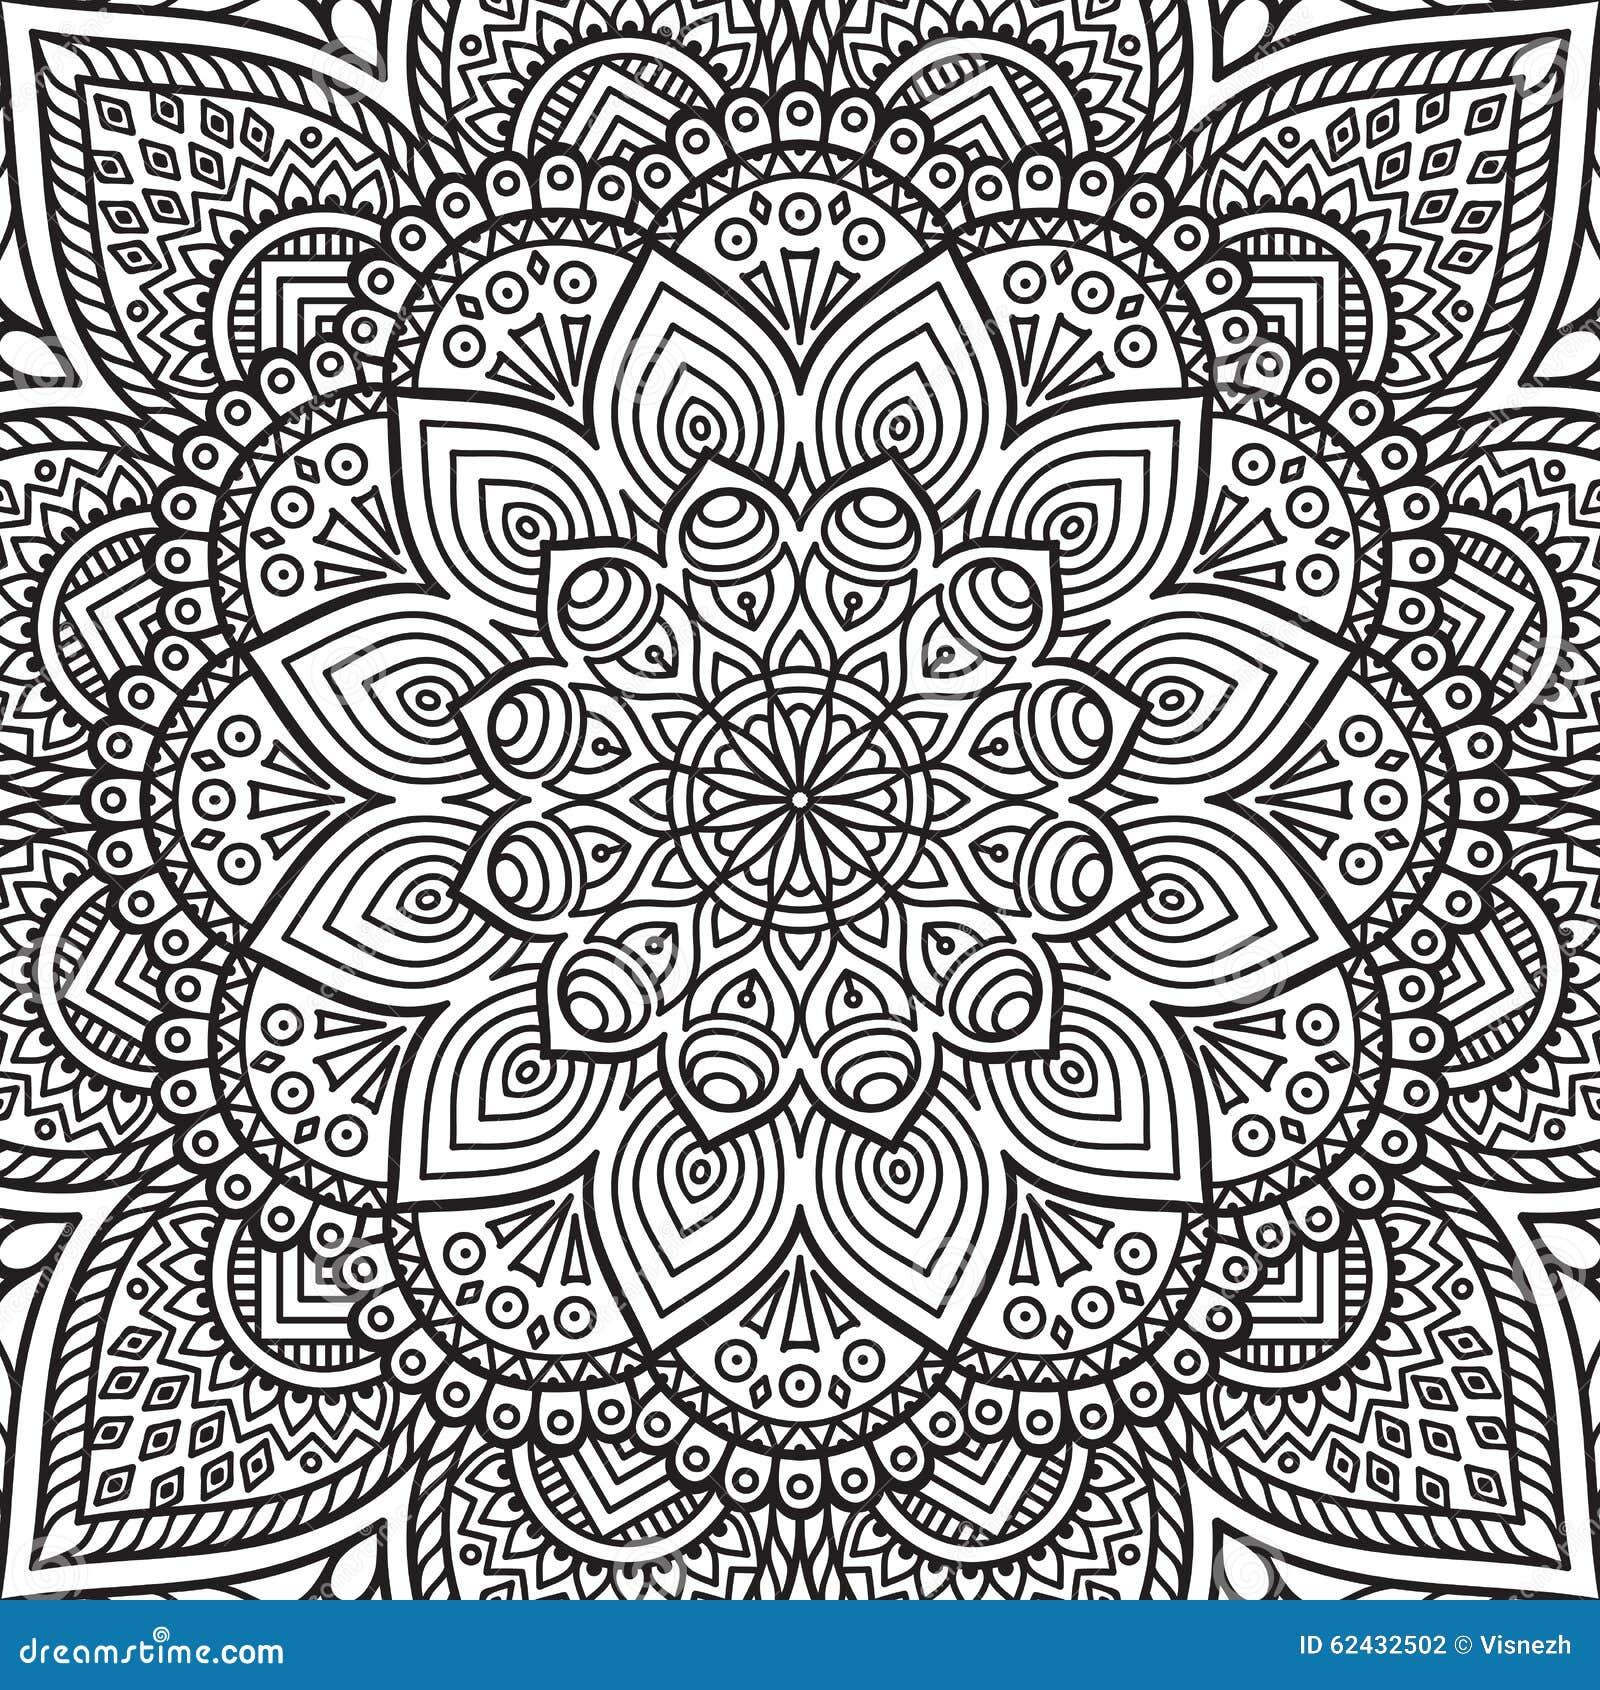 Mandala Coloring Page Stock Vector Illustration Of